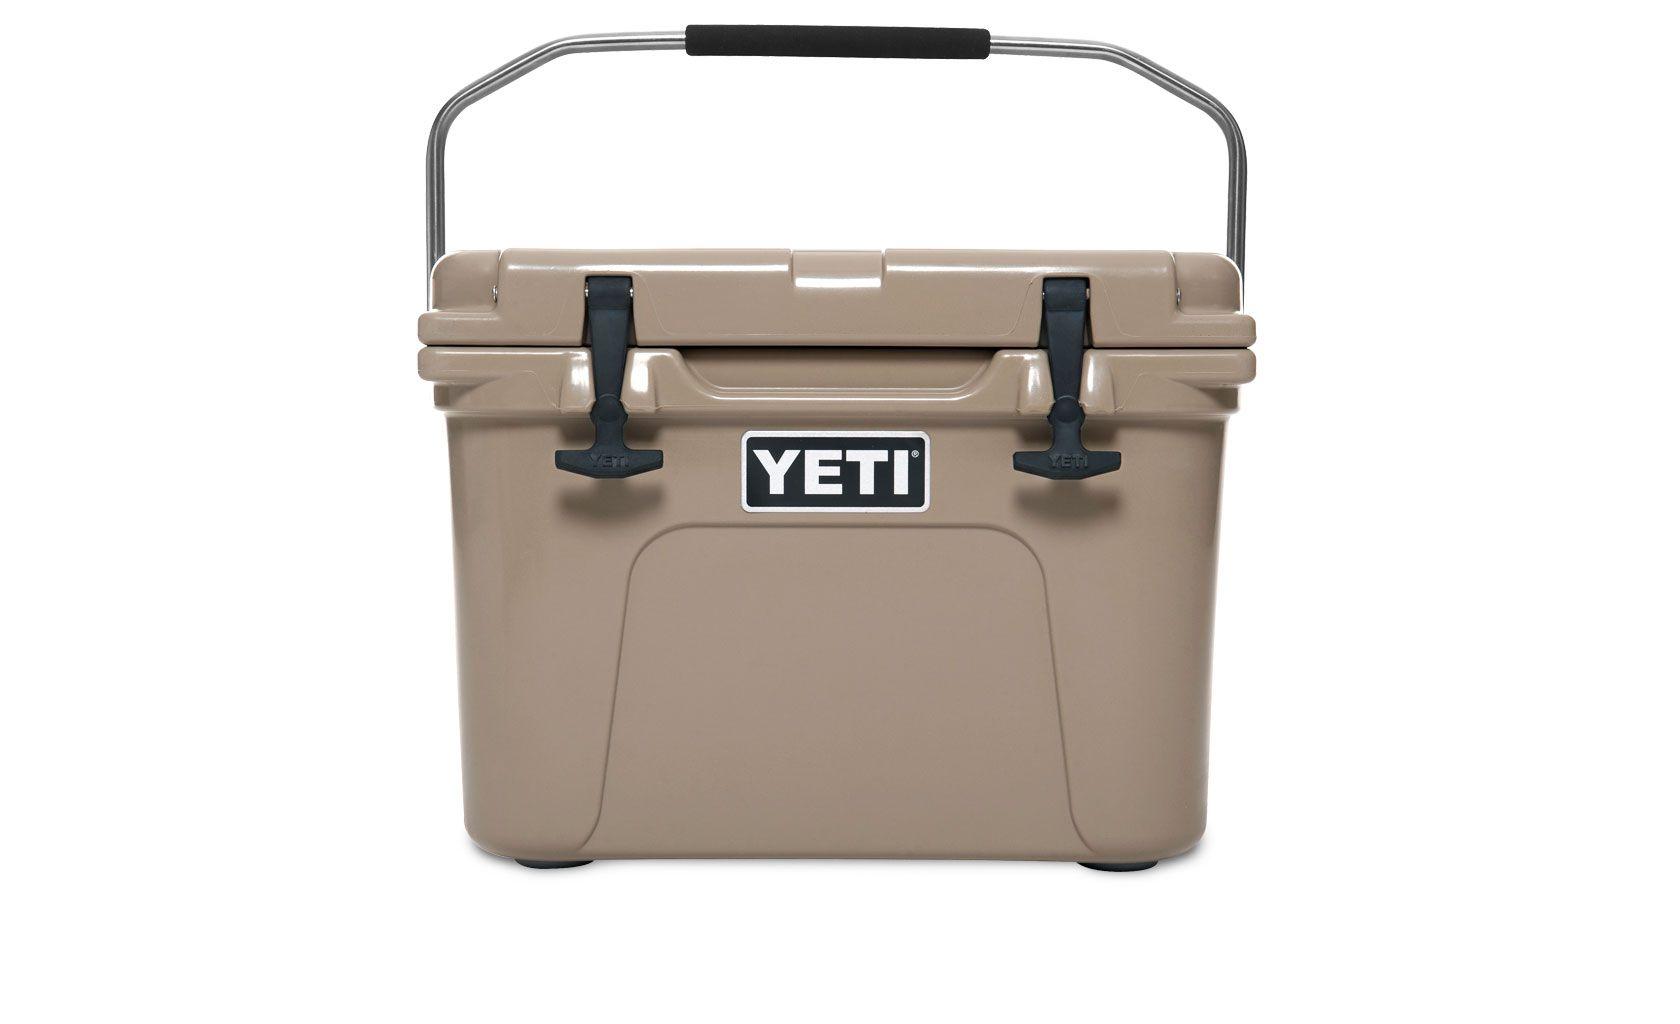 Roadie 20 Cooler Yeti Yeti Roadie Cooler Yeti